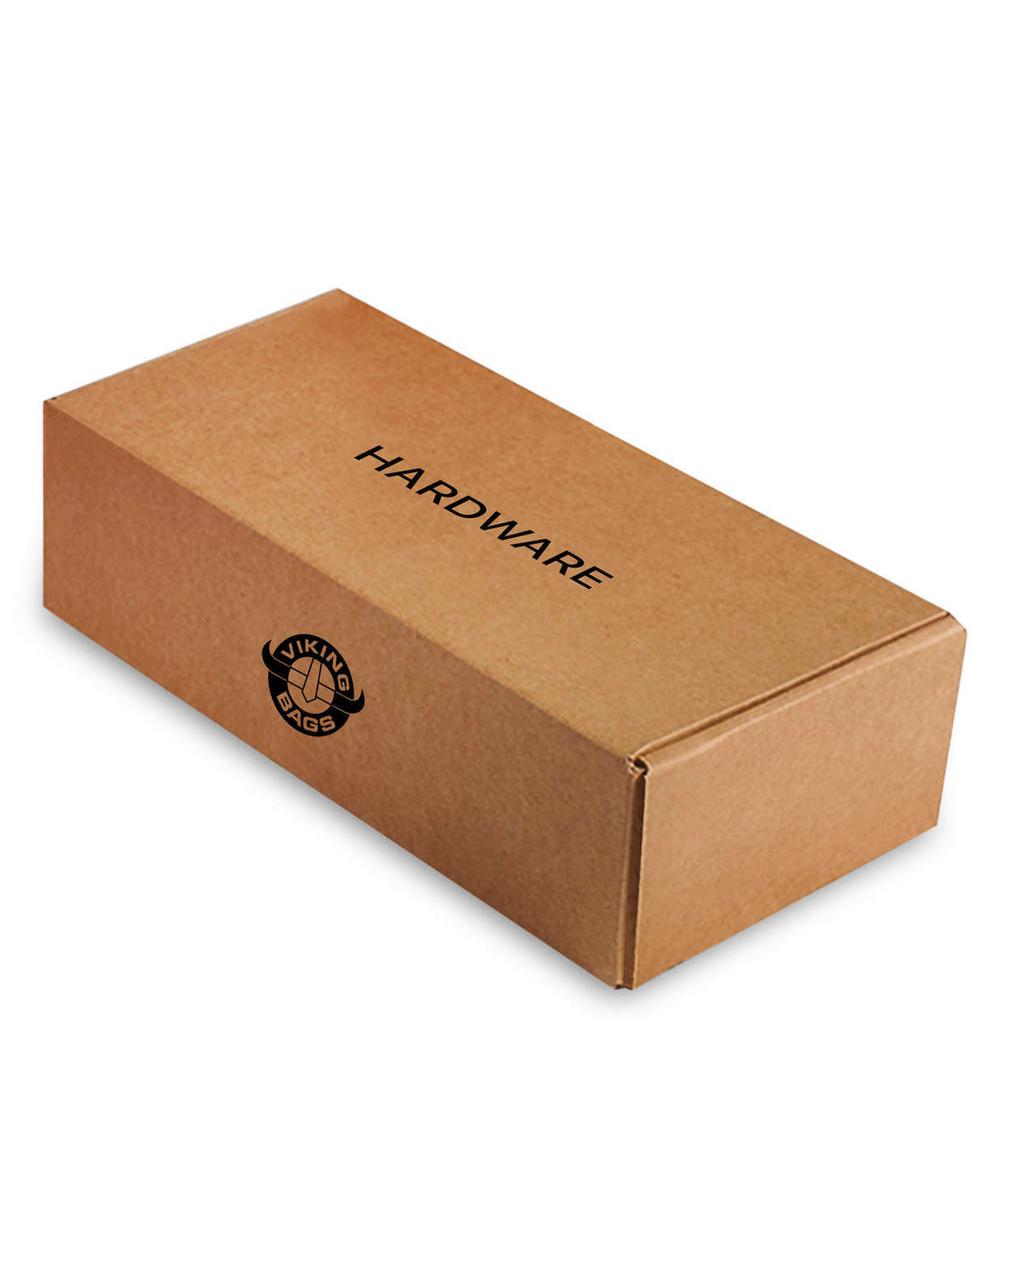 Honda 750 Shadow Aero Warrior Medium Motorcycle Saddlebags Box